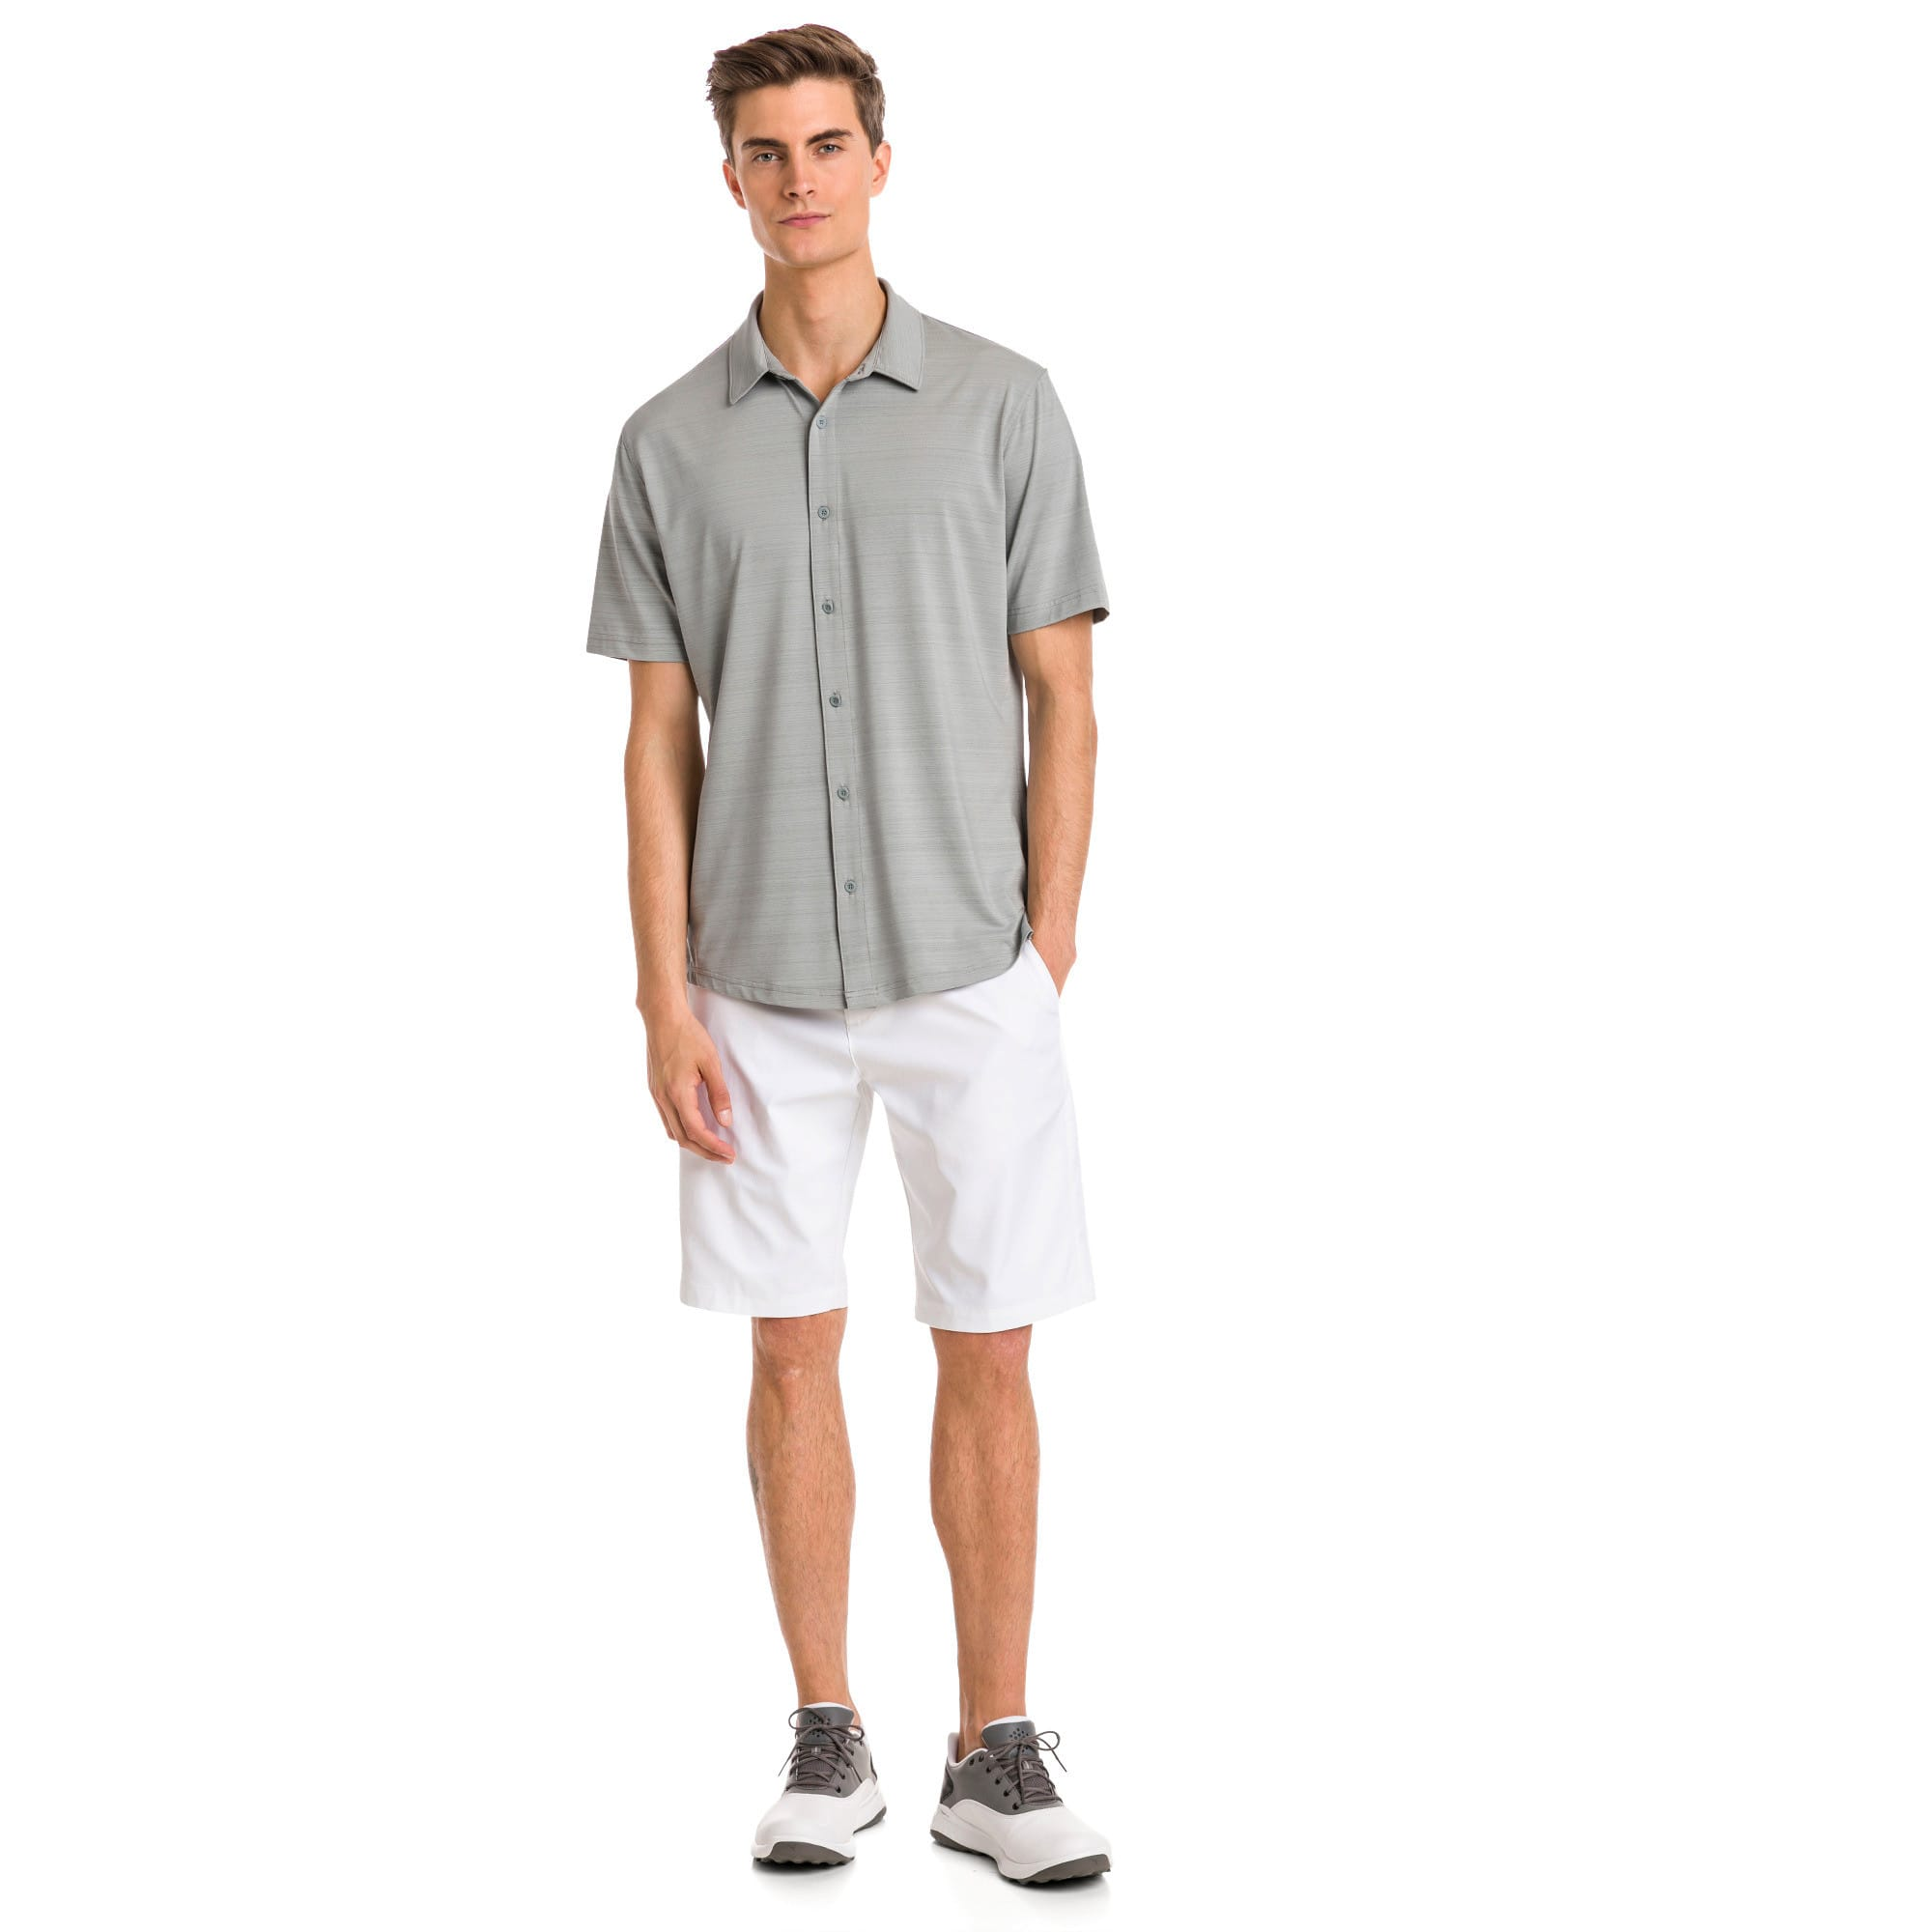 Thumbnail 3 of Breezer Short Sleeve Men's Golf Shirt, Quarry, medium